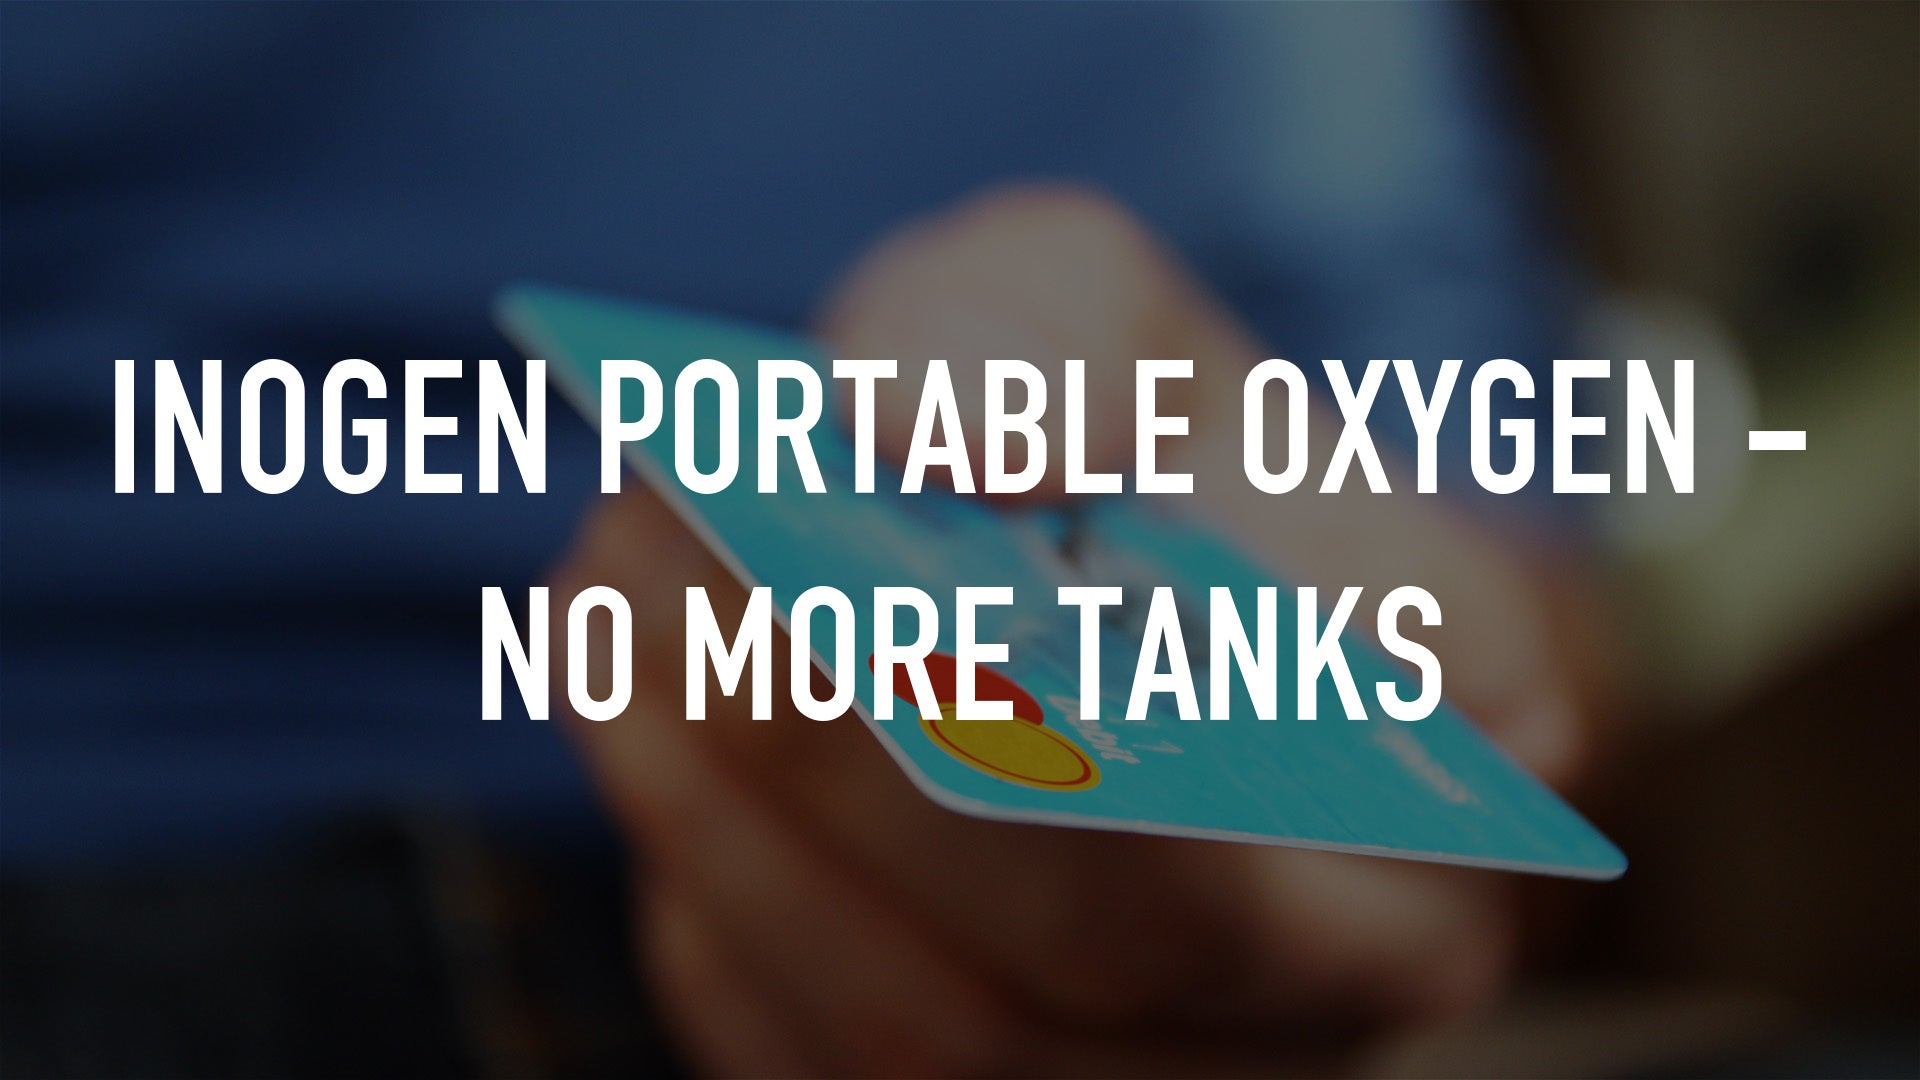 Inogen Portable Oxygen - No More Tanks